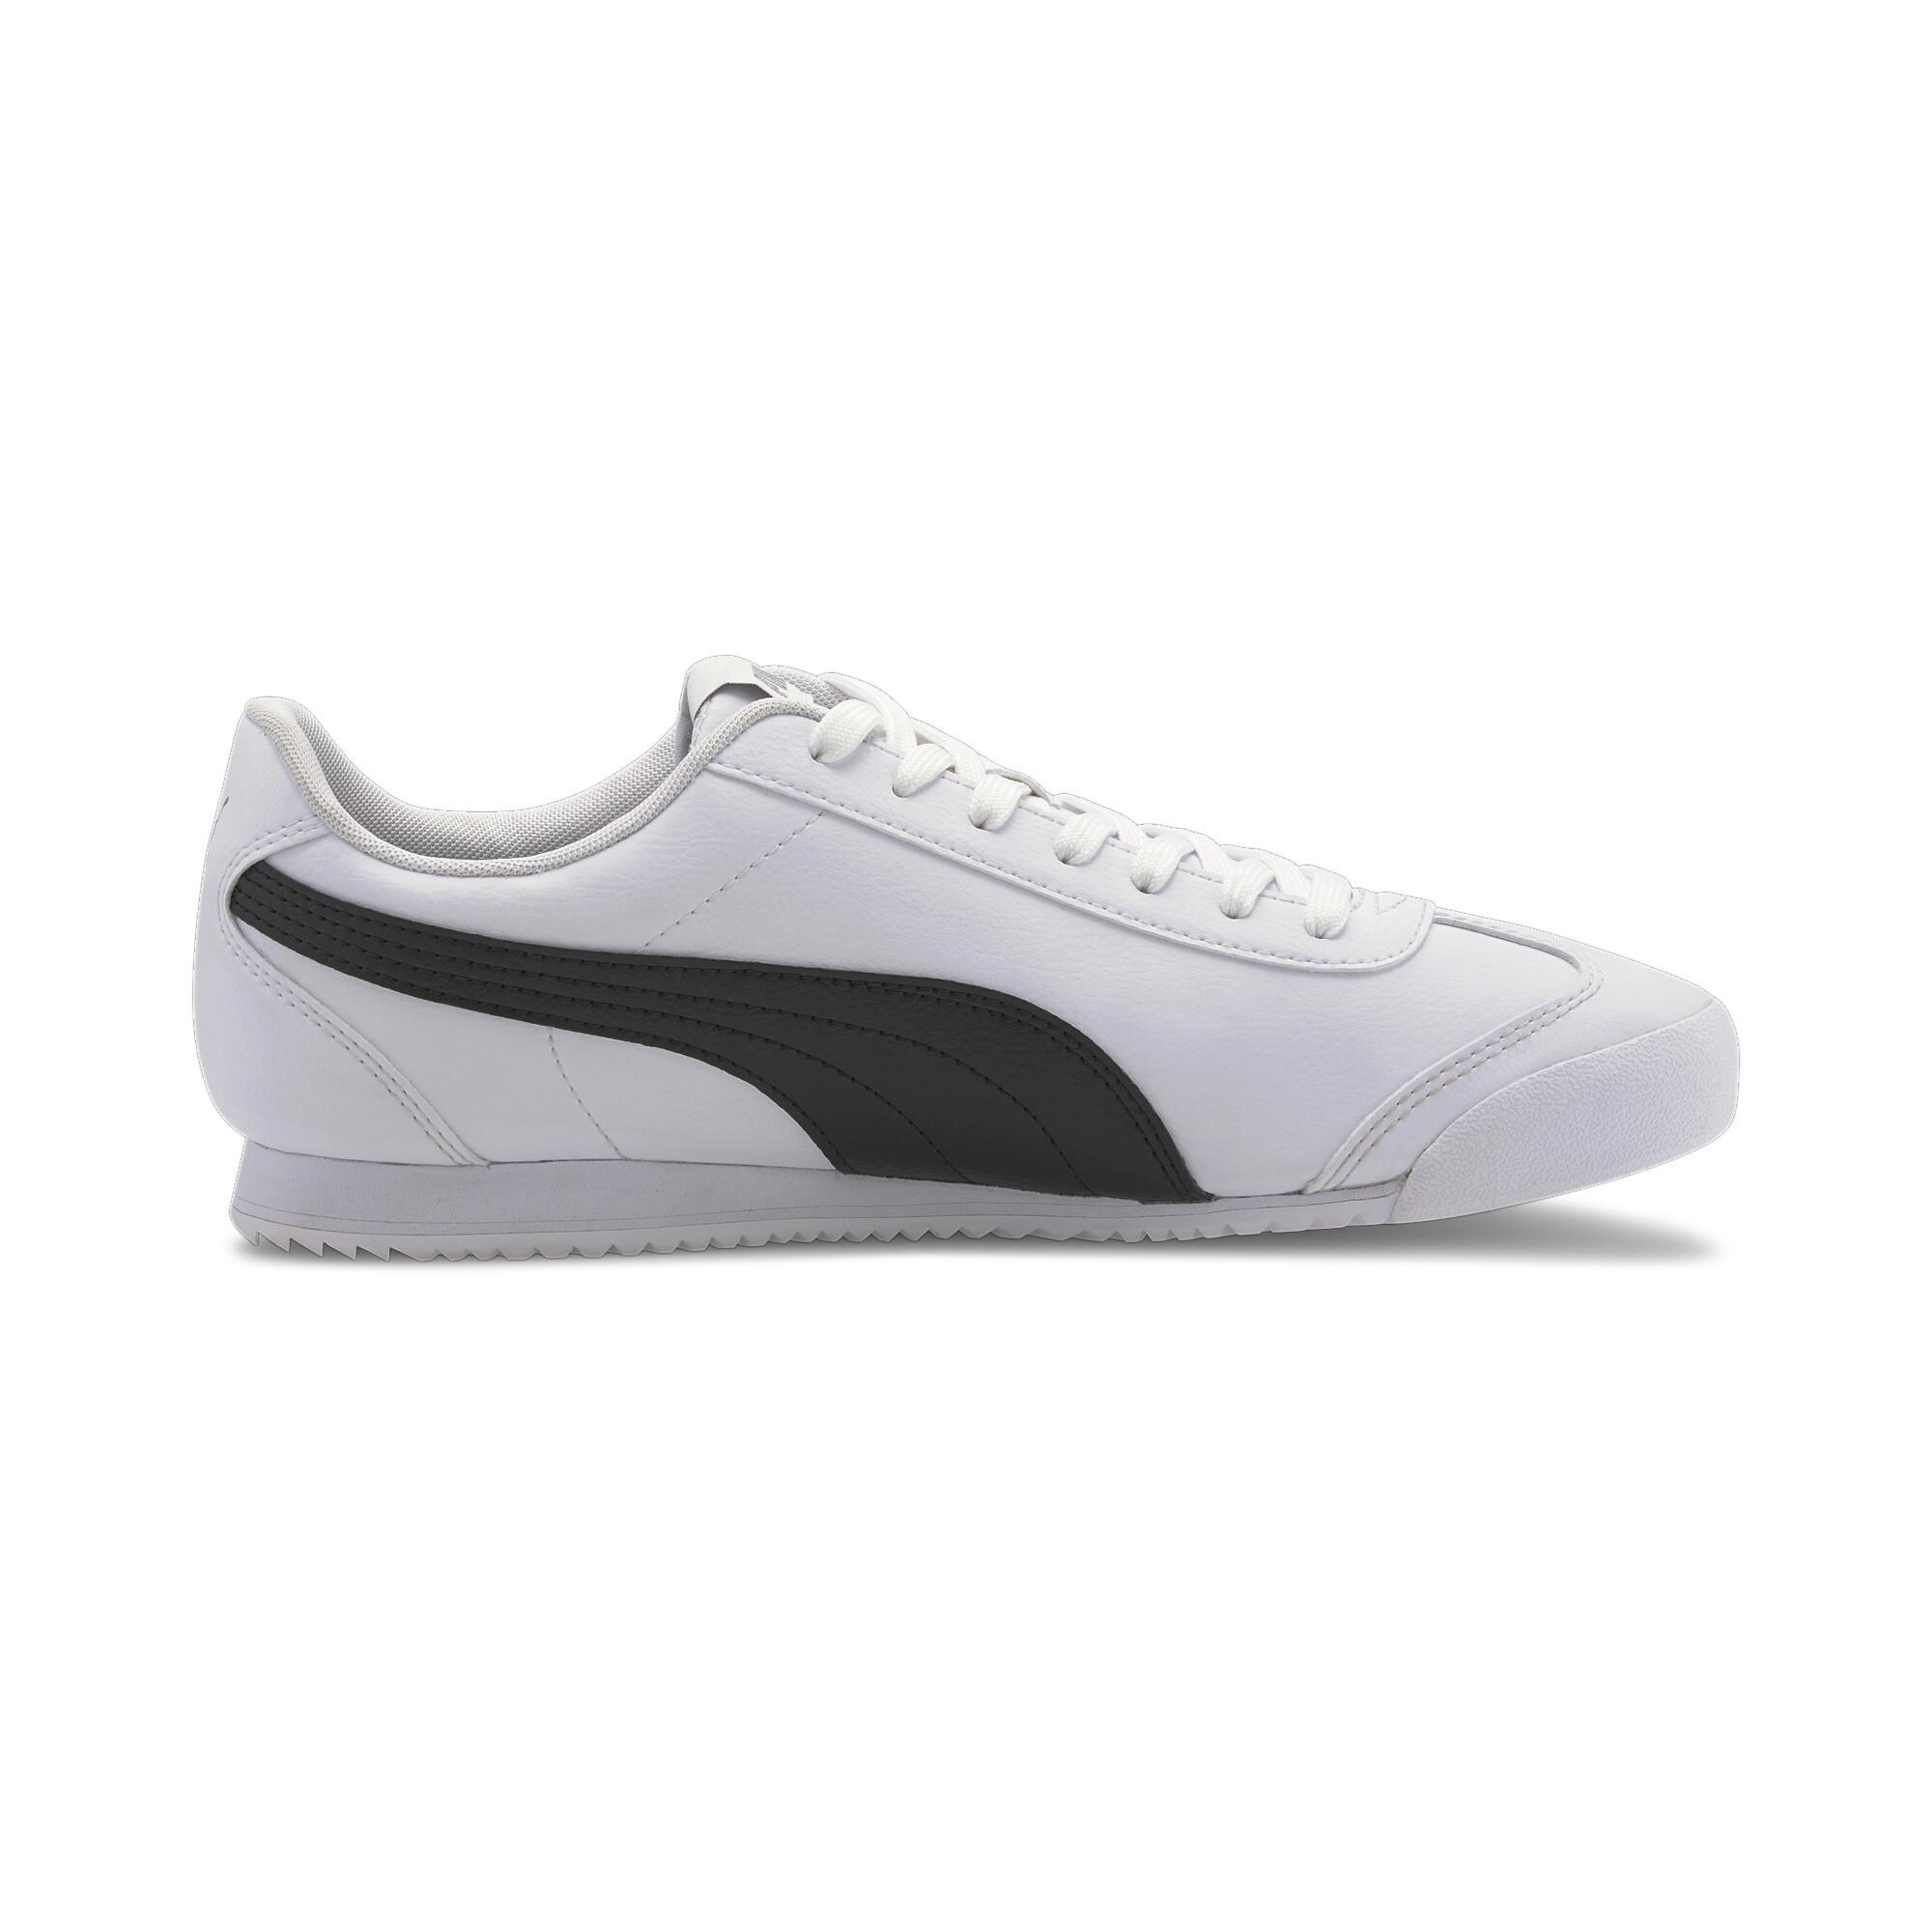 thumbnail 23 - PUMA Men's Turino SL Sneakers